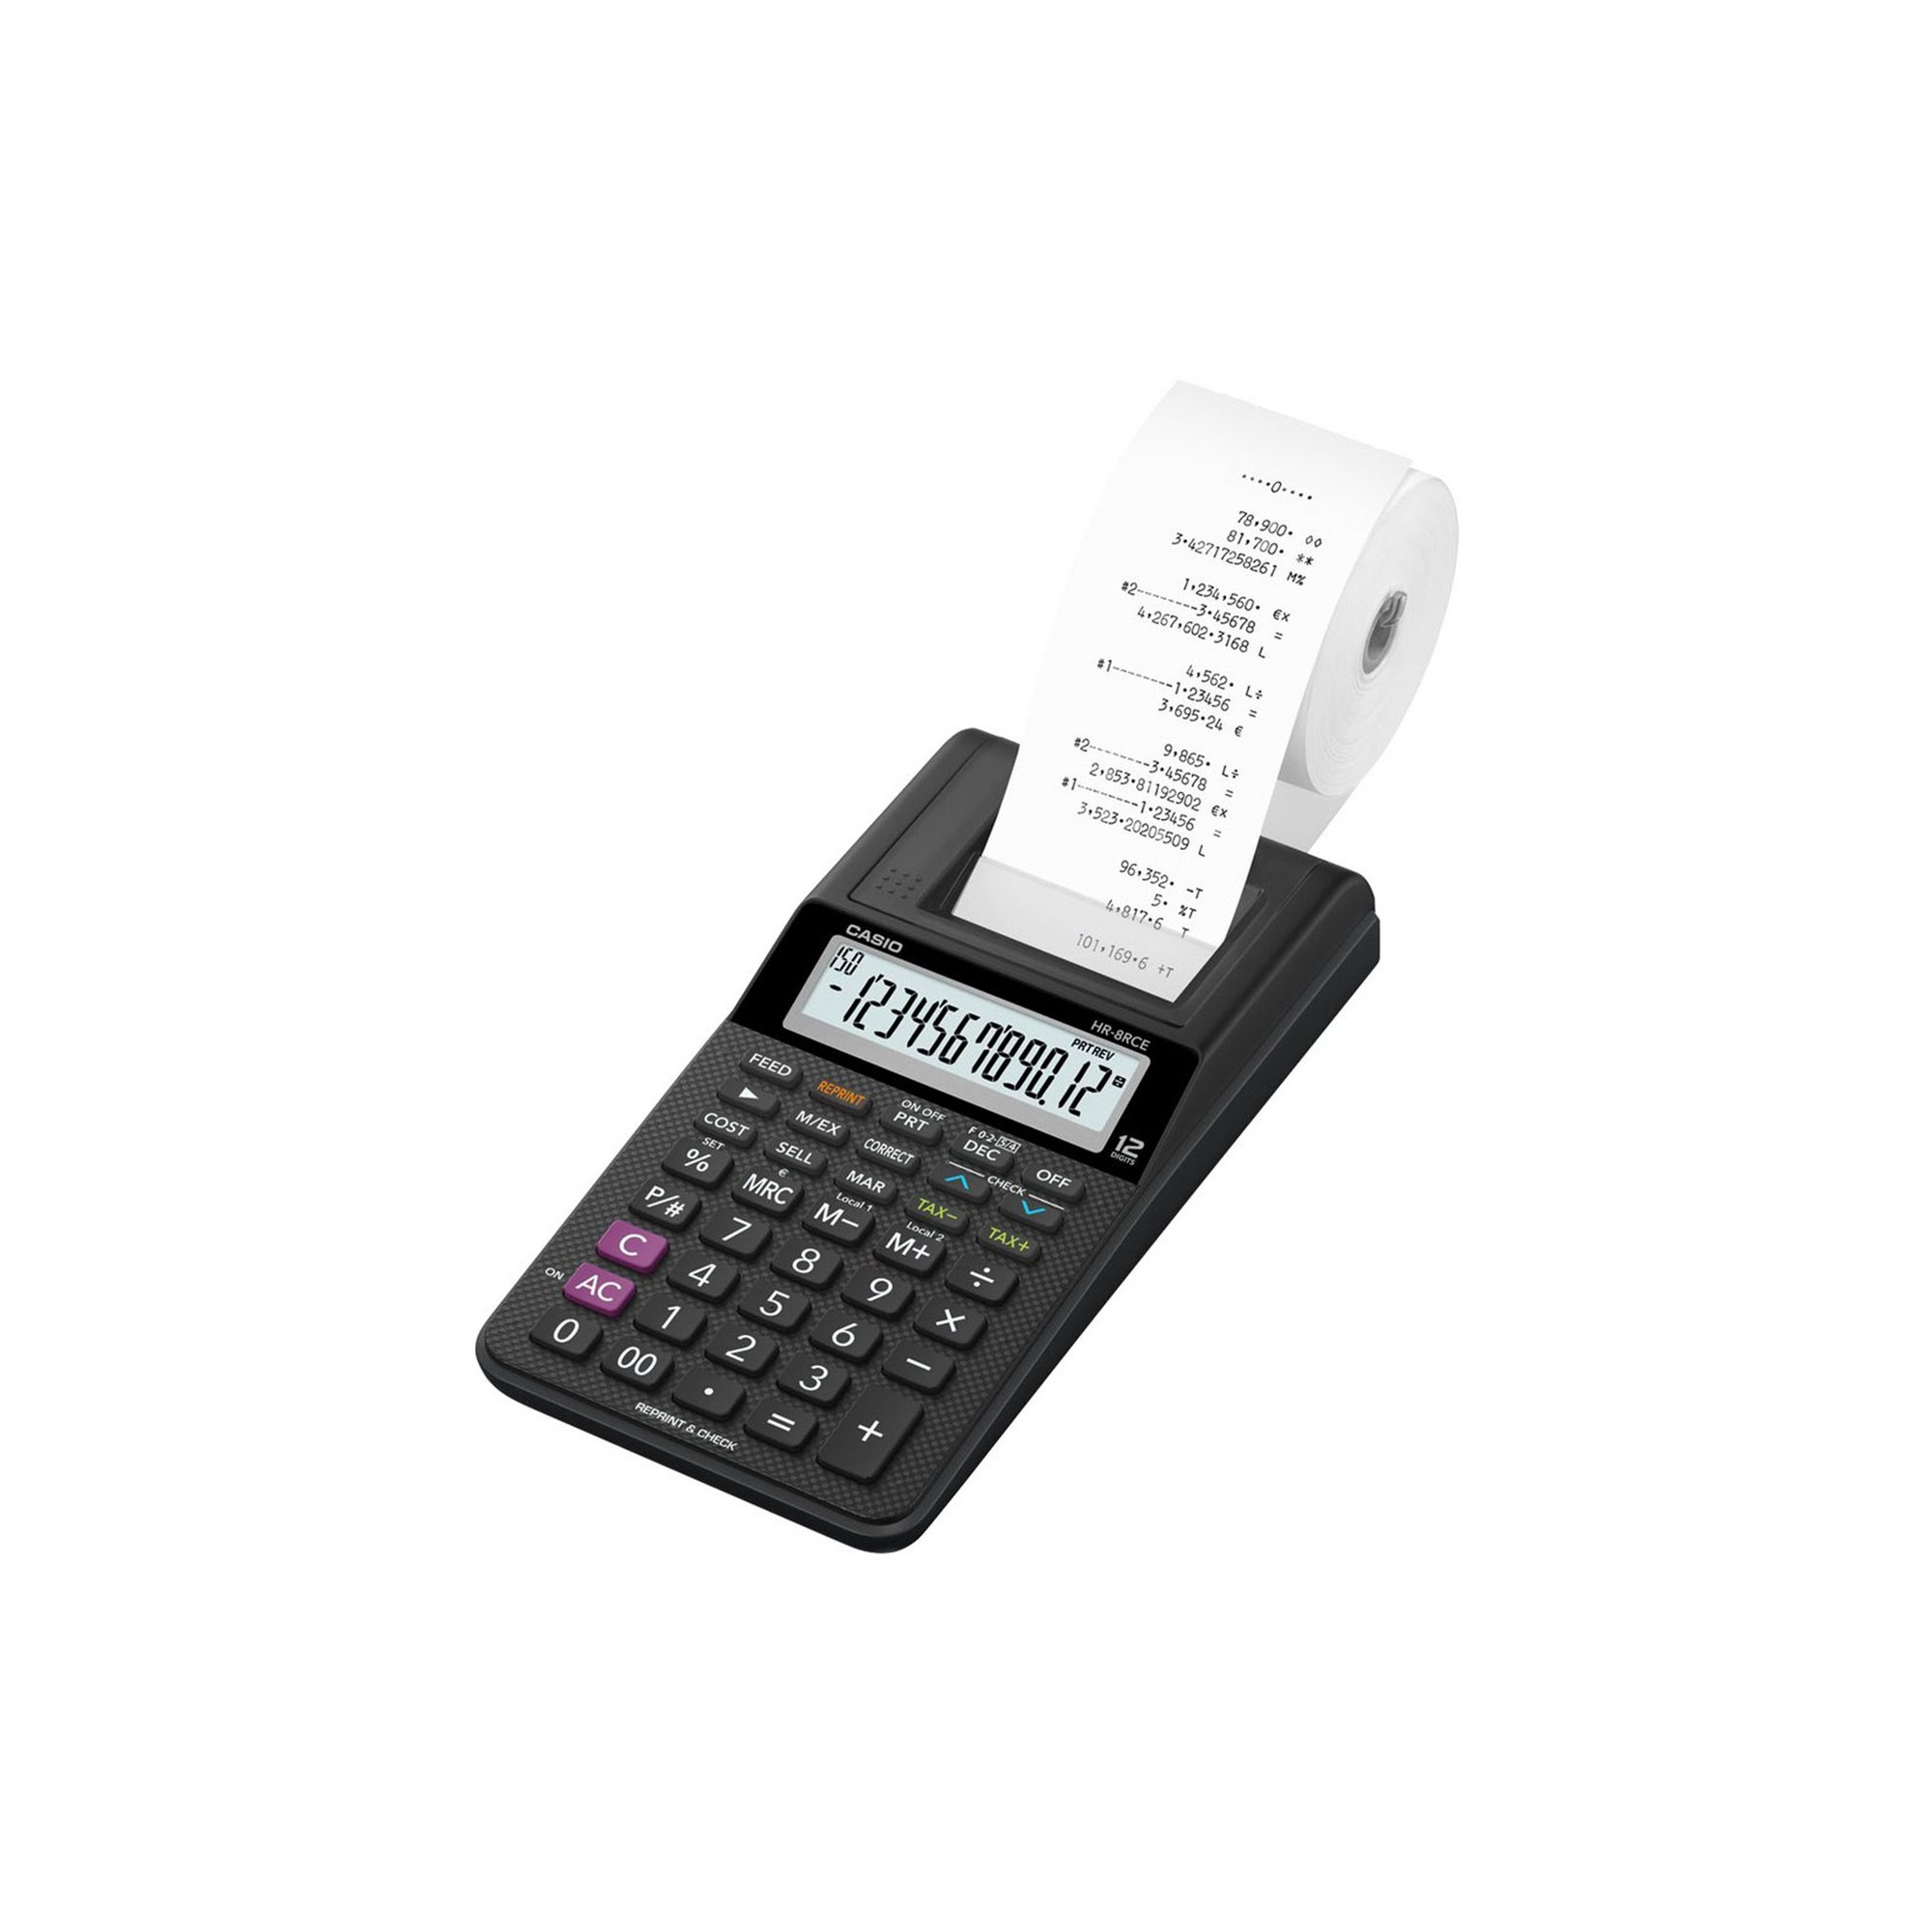 Image of Casio HR8RCE-BK Compact 12 Digit Display Printing Calculator